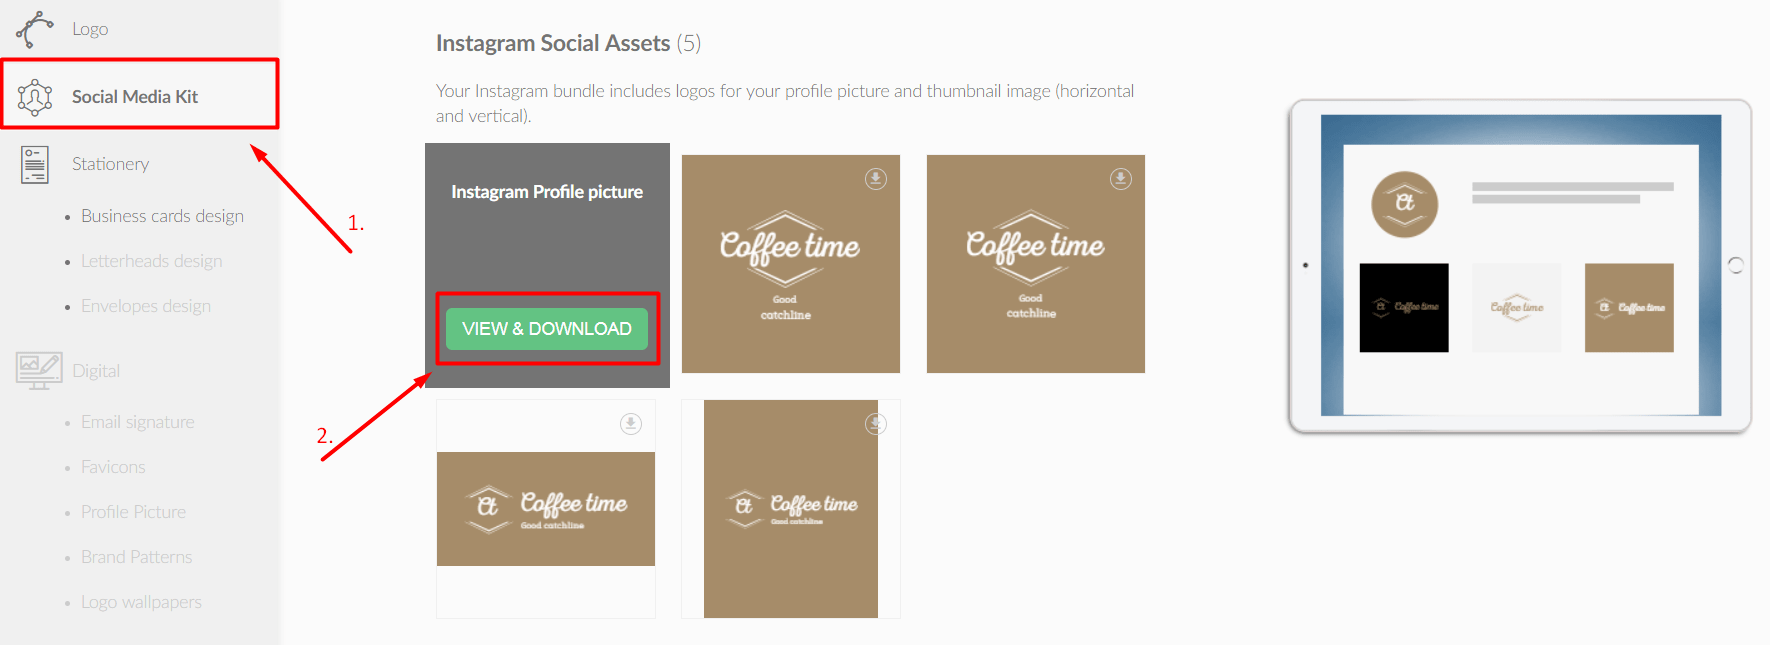 Logos for social media